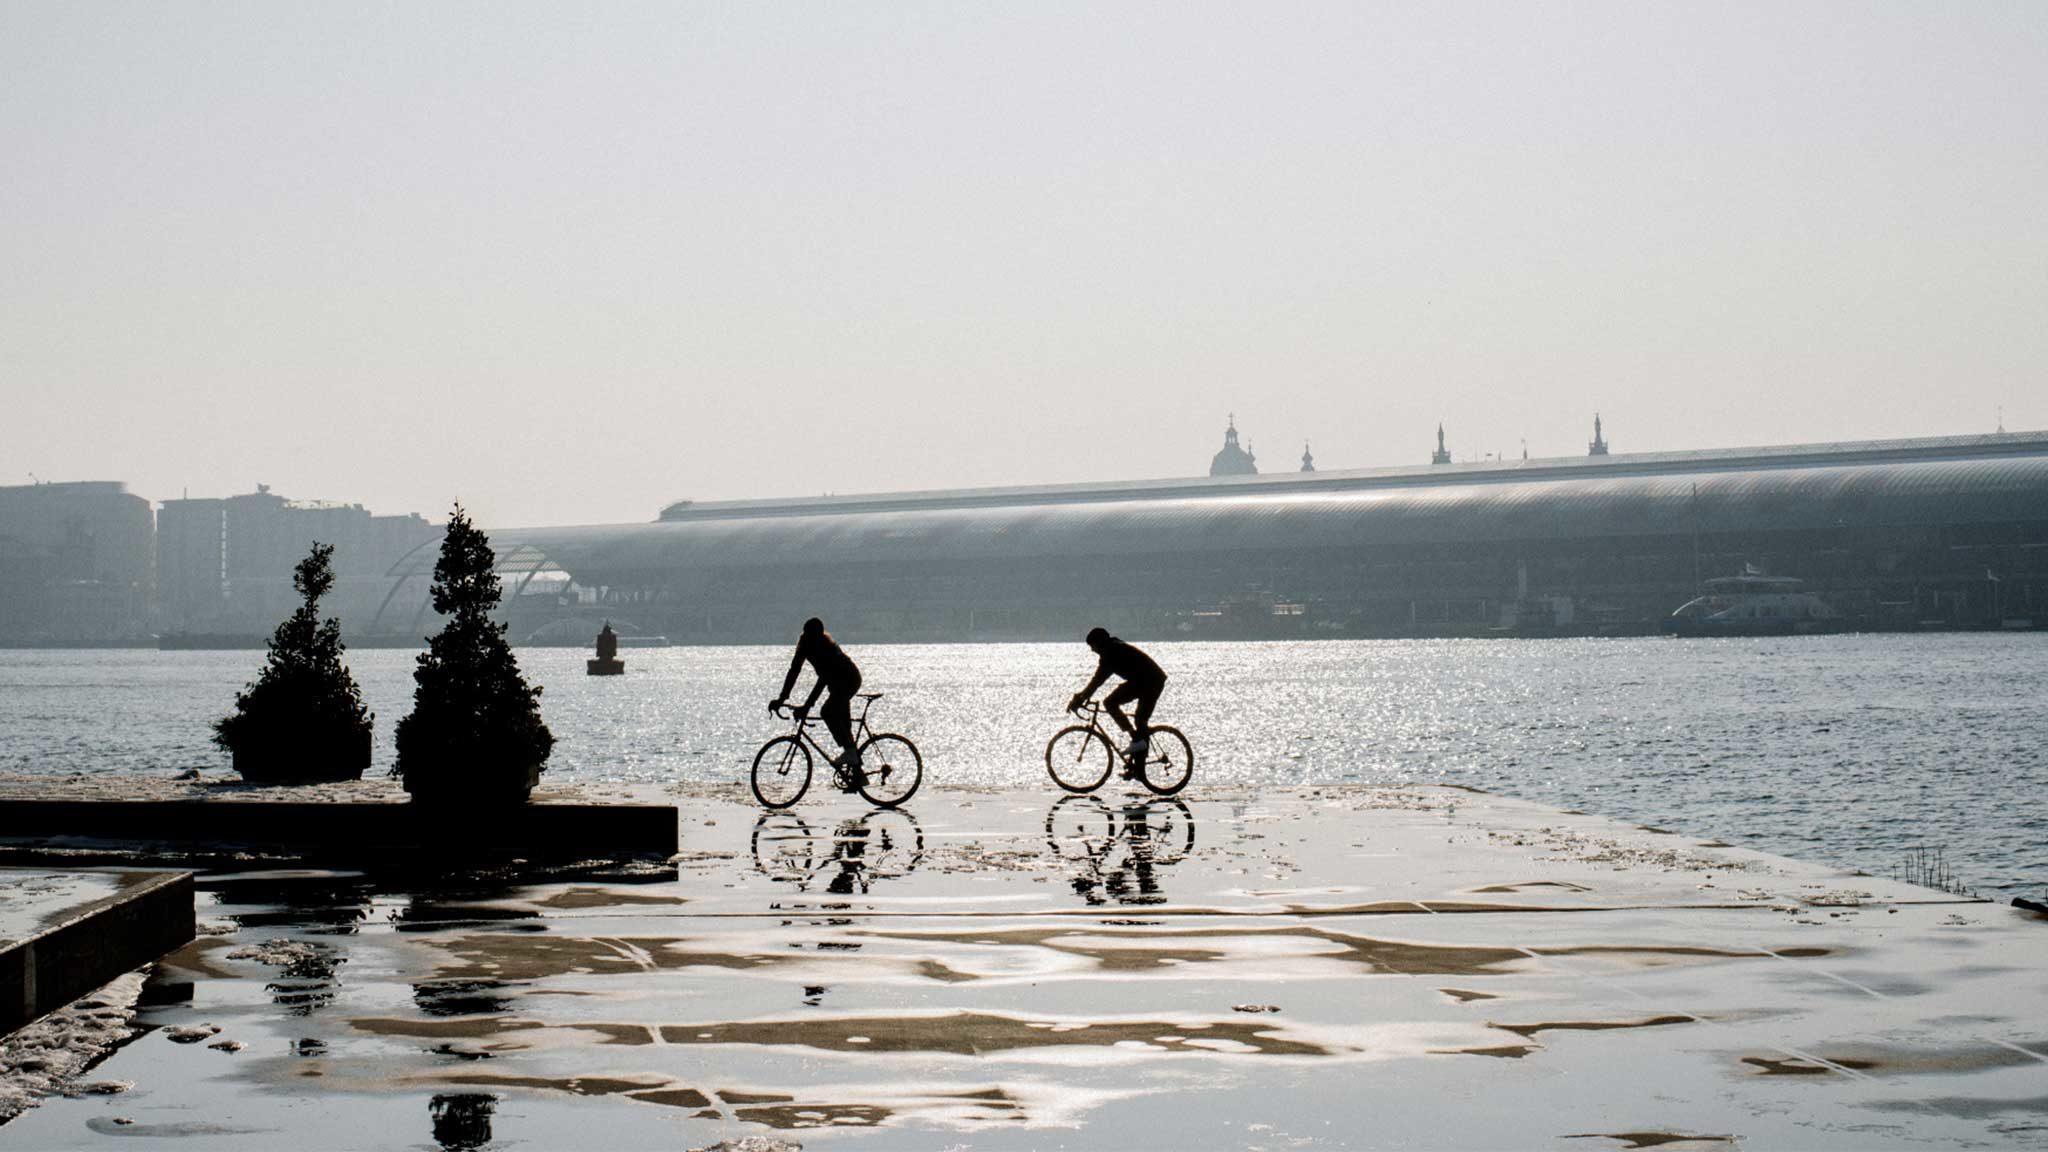 Rapha Rides komt naar Amsterdam! Proef de fietscultuur in eigen land